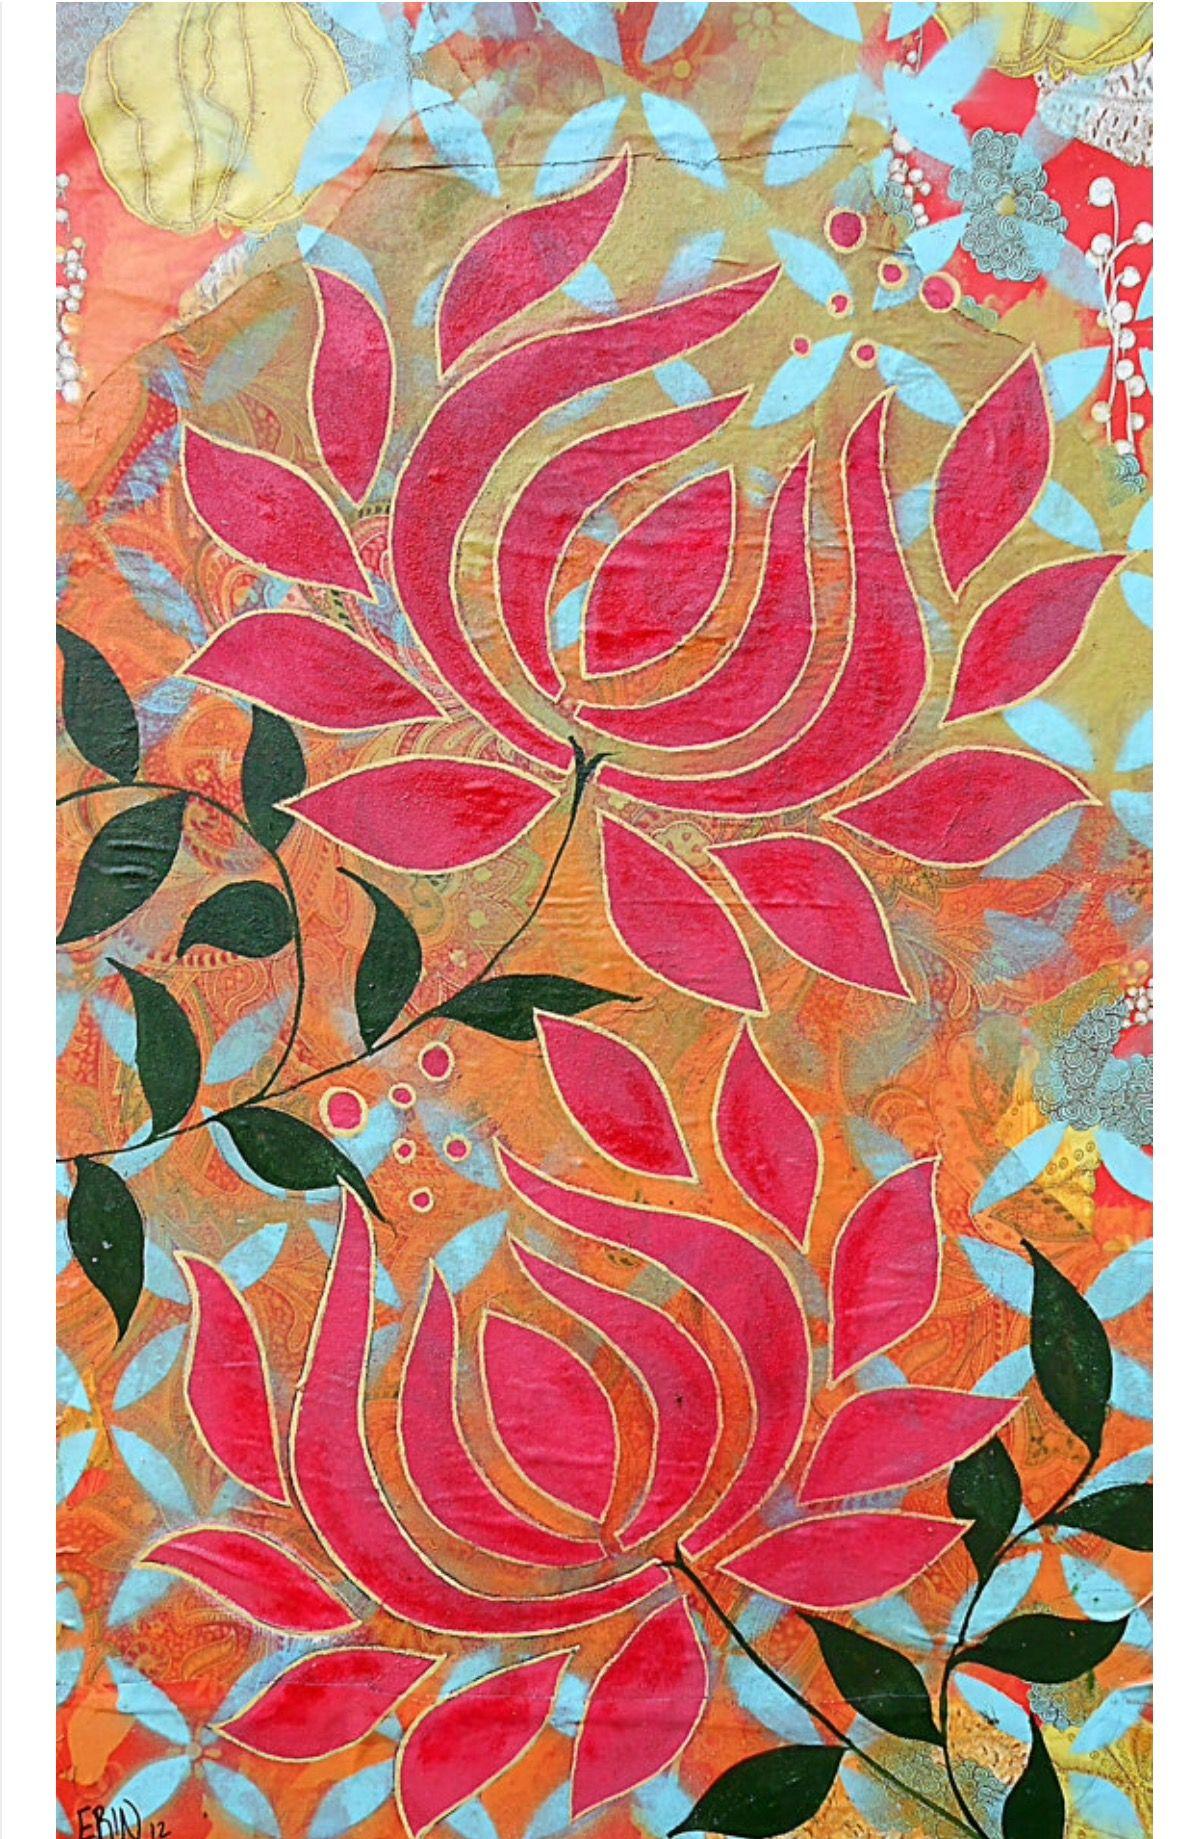 Pin By Sangita Aurora On Graphics In 2018 Pinterest Prints